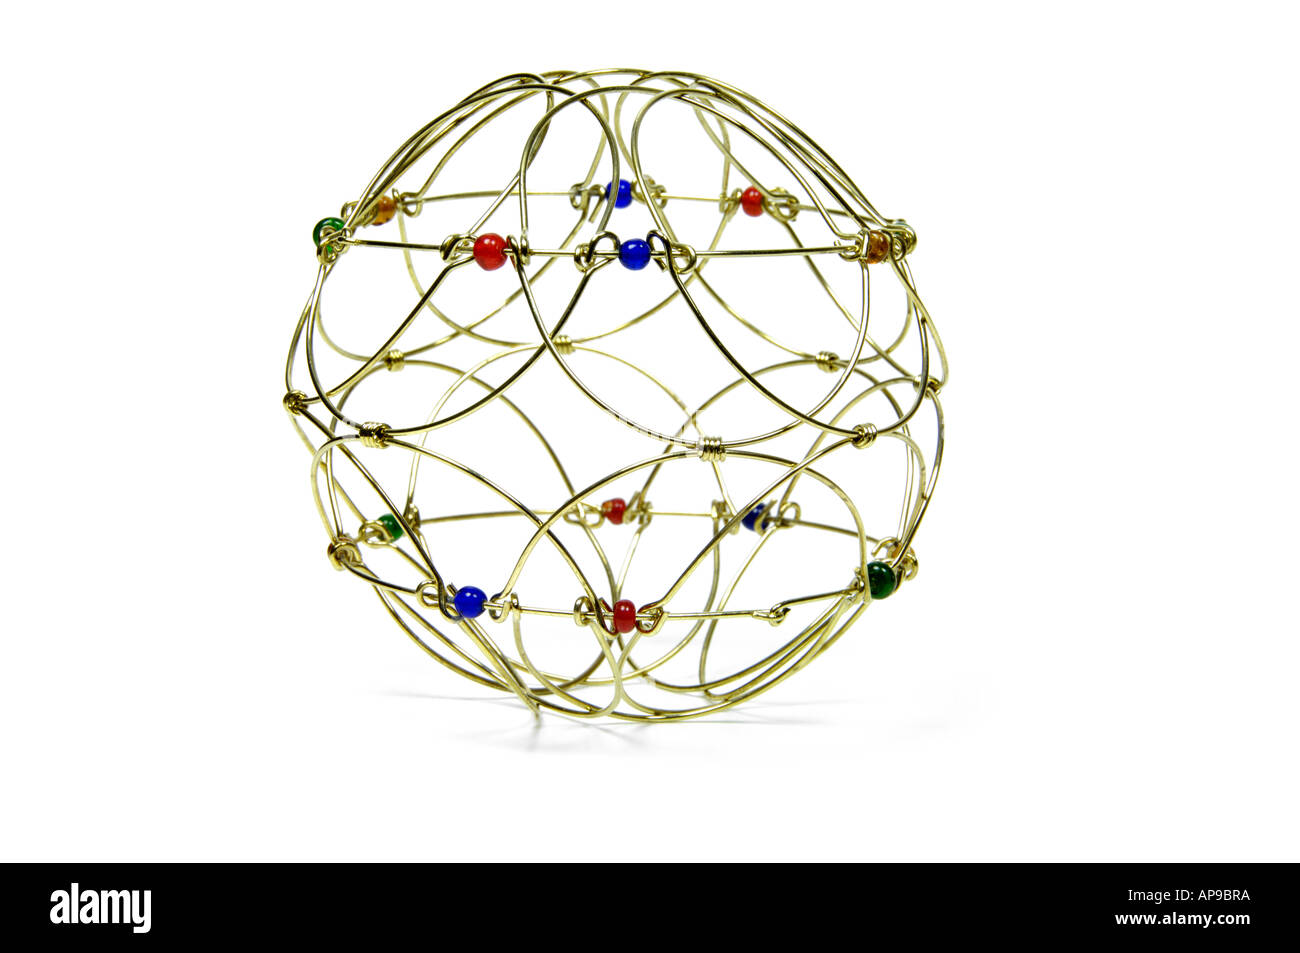 Mandala a buddhist meditation 3d instrument - Stock Image